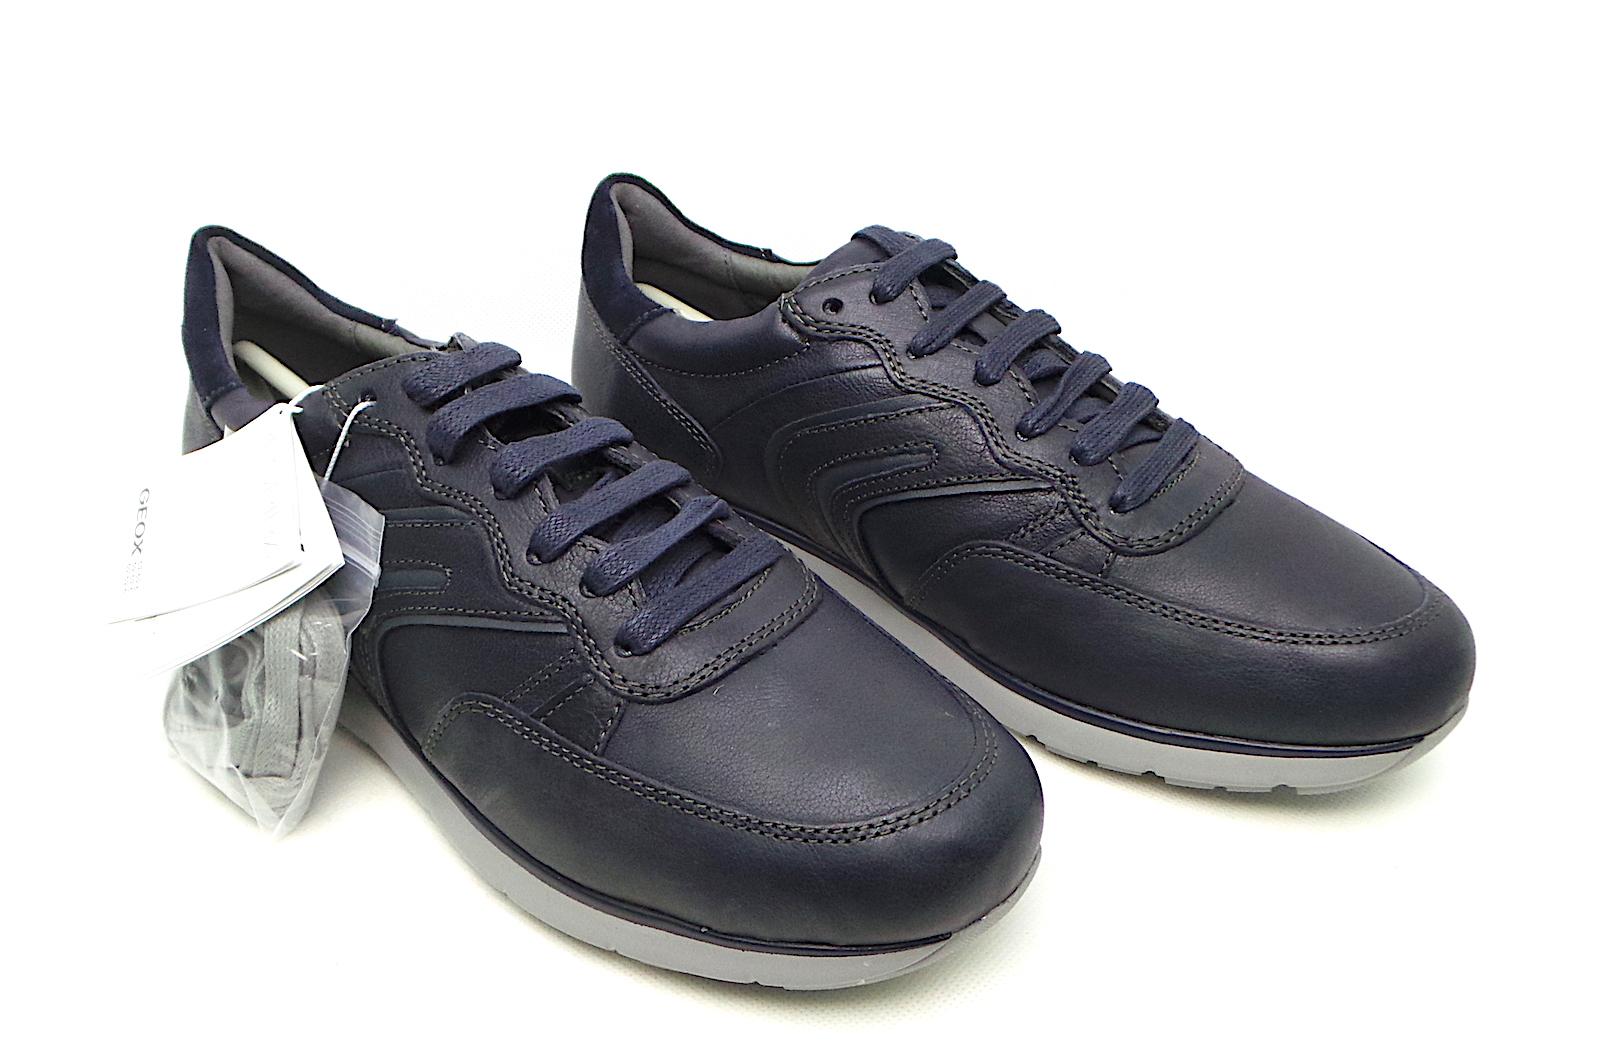 scarpe uomo delpopoloshop GEOX SCARPE UOMO COD